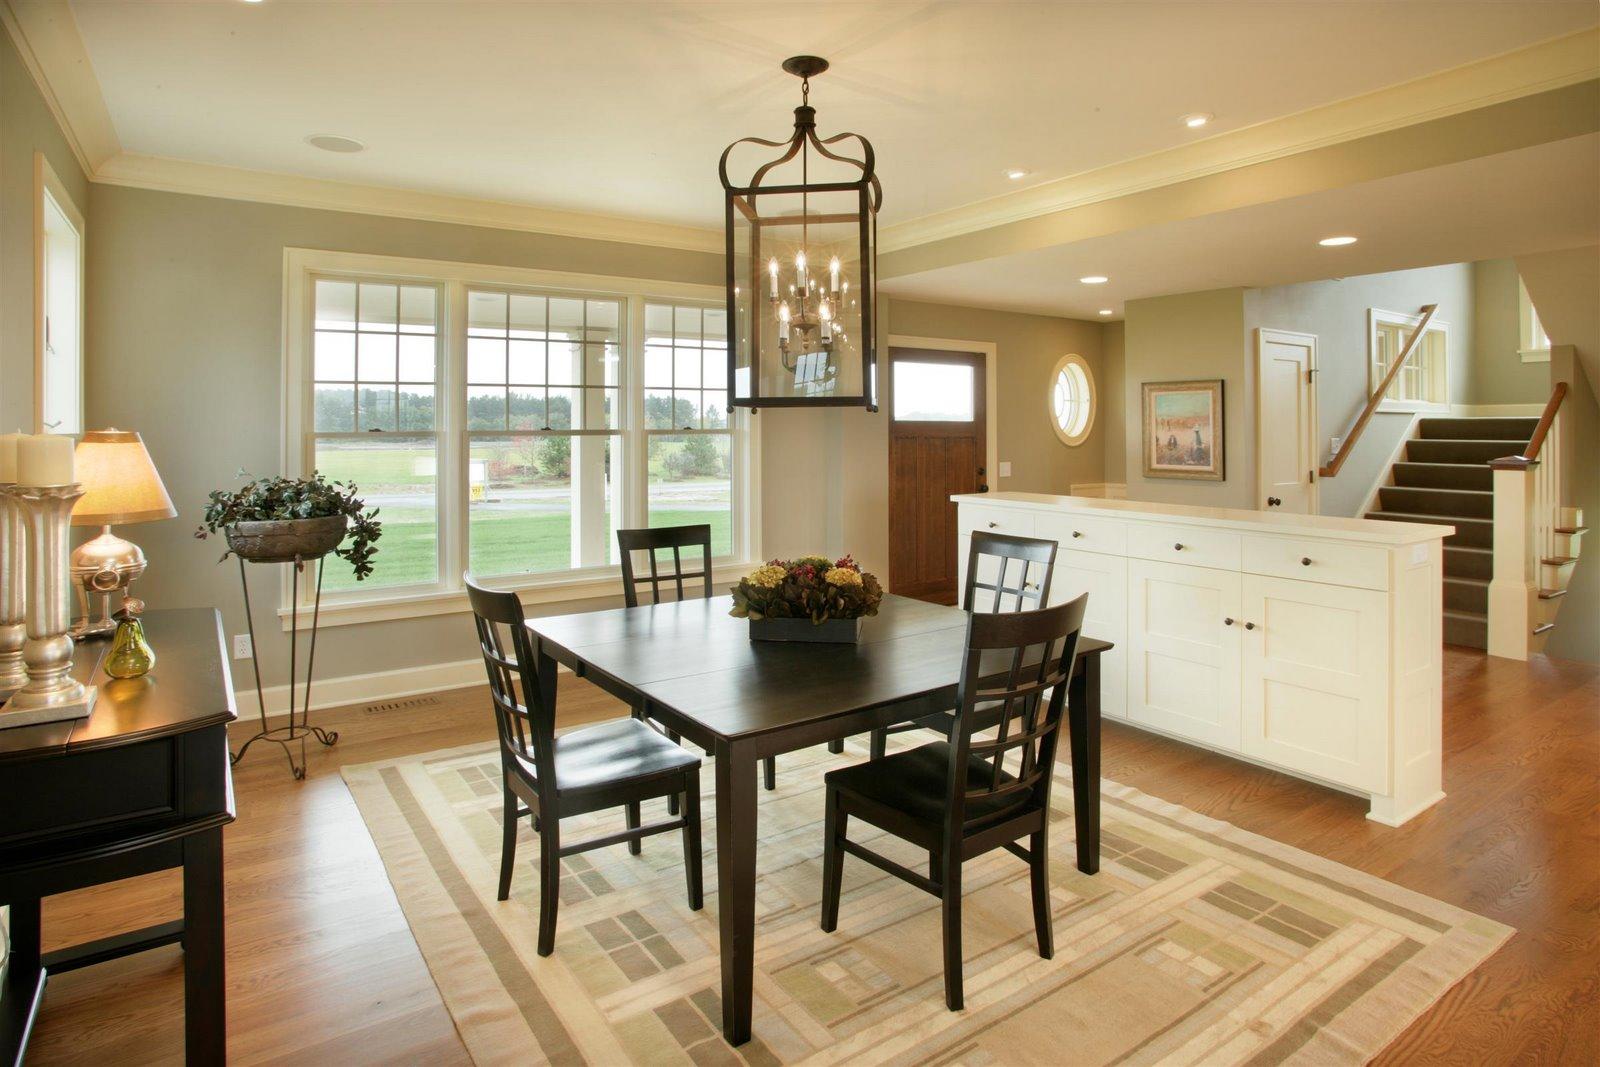 interior-design-diy Breaking Down the House: Tips for Successful DIY Interior Design